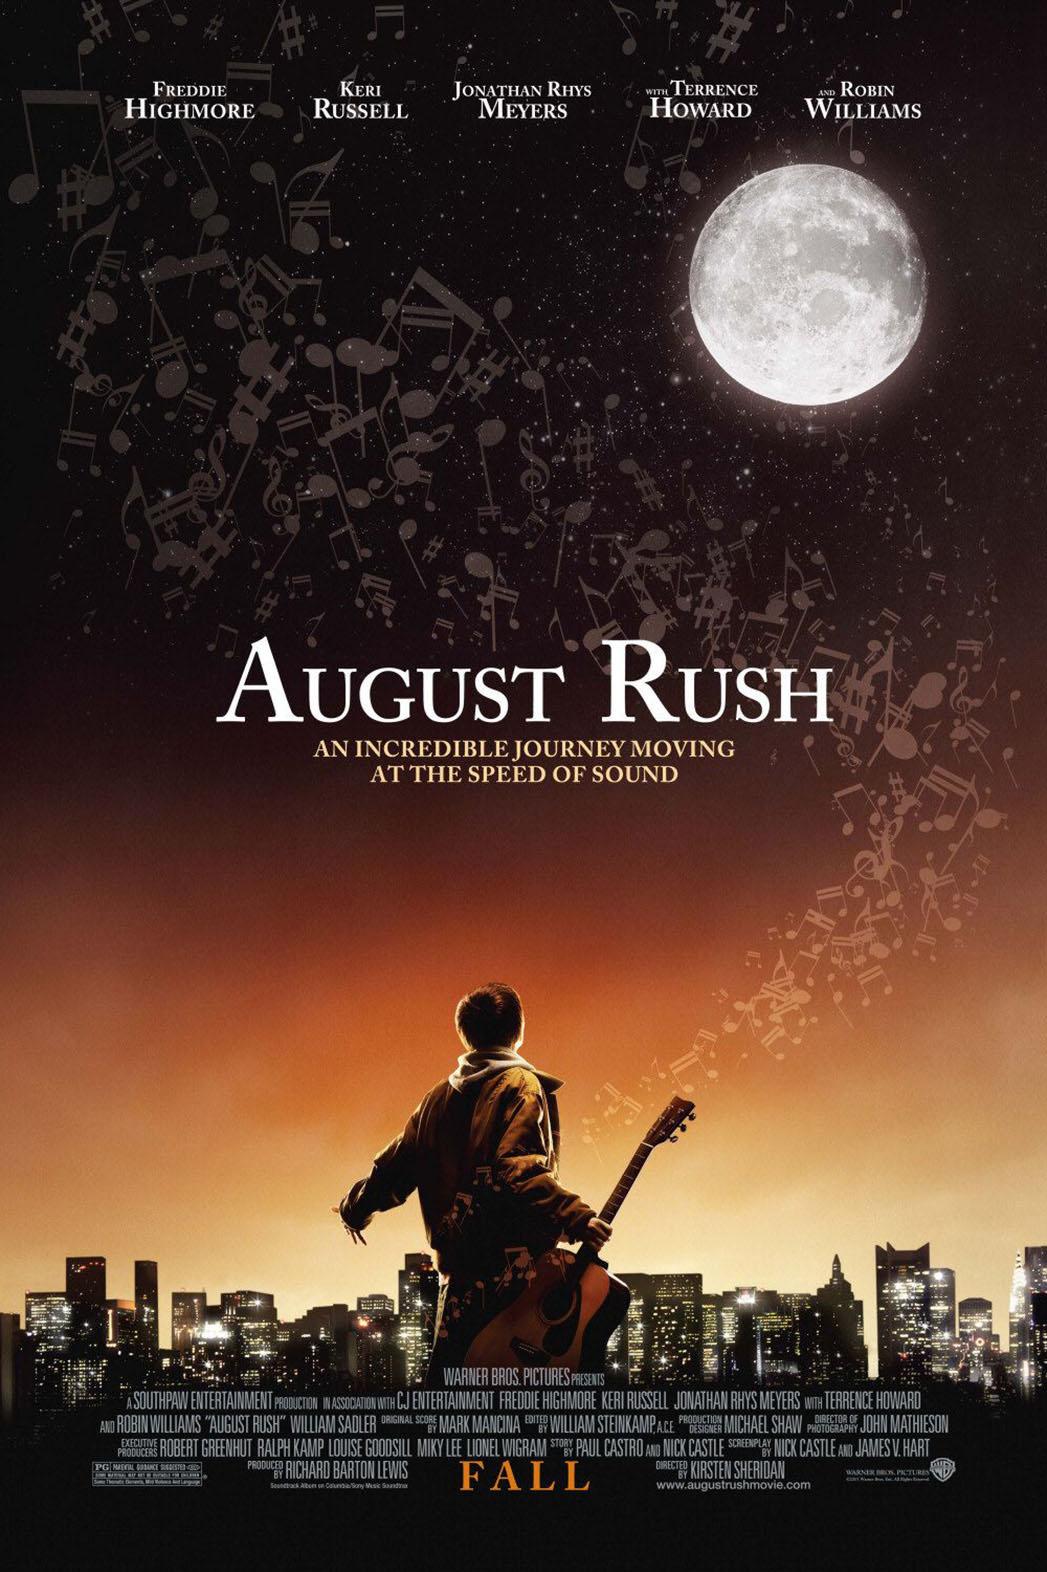 August Rush Poster - P 2014